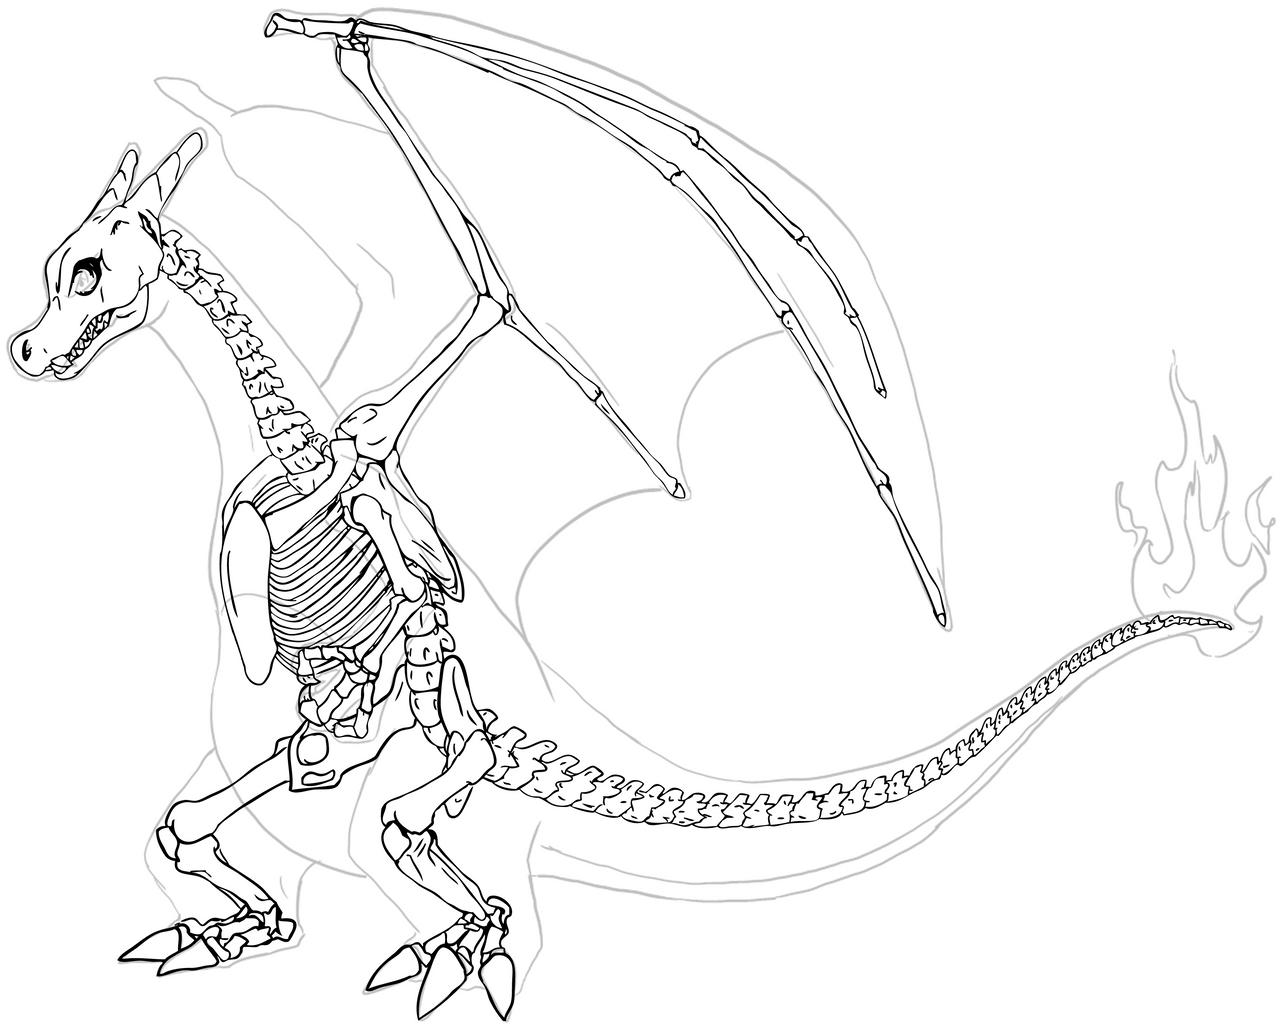 Charmeleon Evolutions Kleurplaat Charizard Skeleton By Chibi Pika On Deviantart